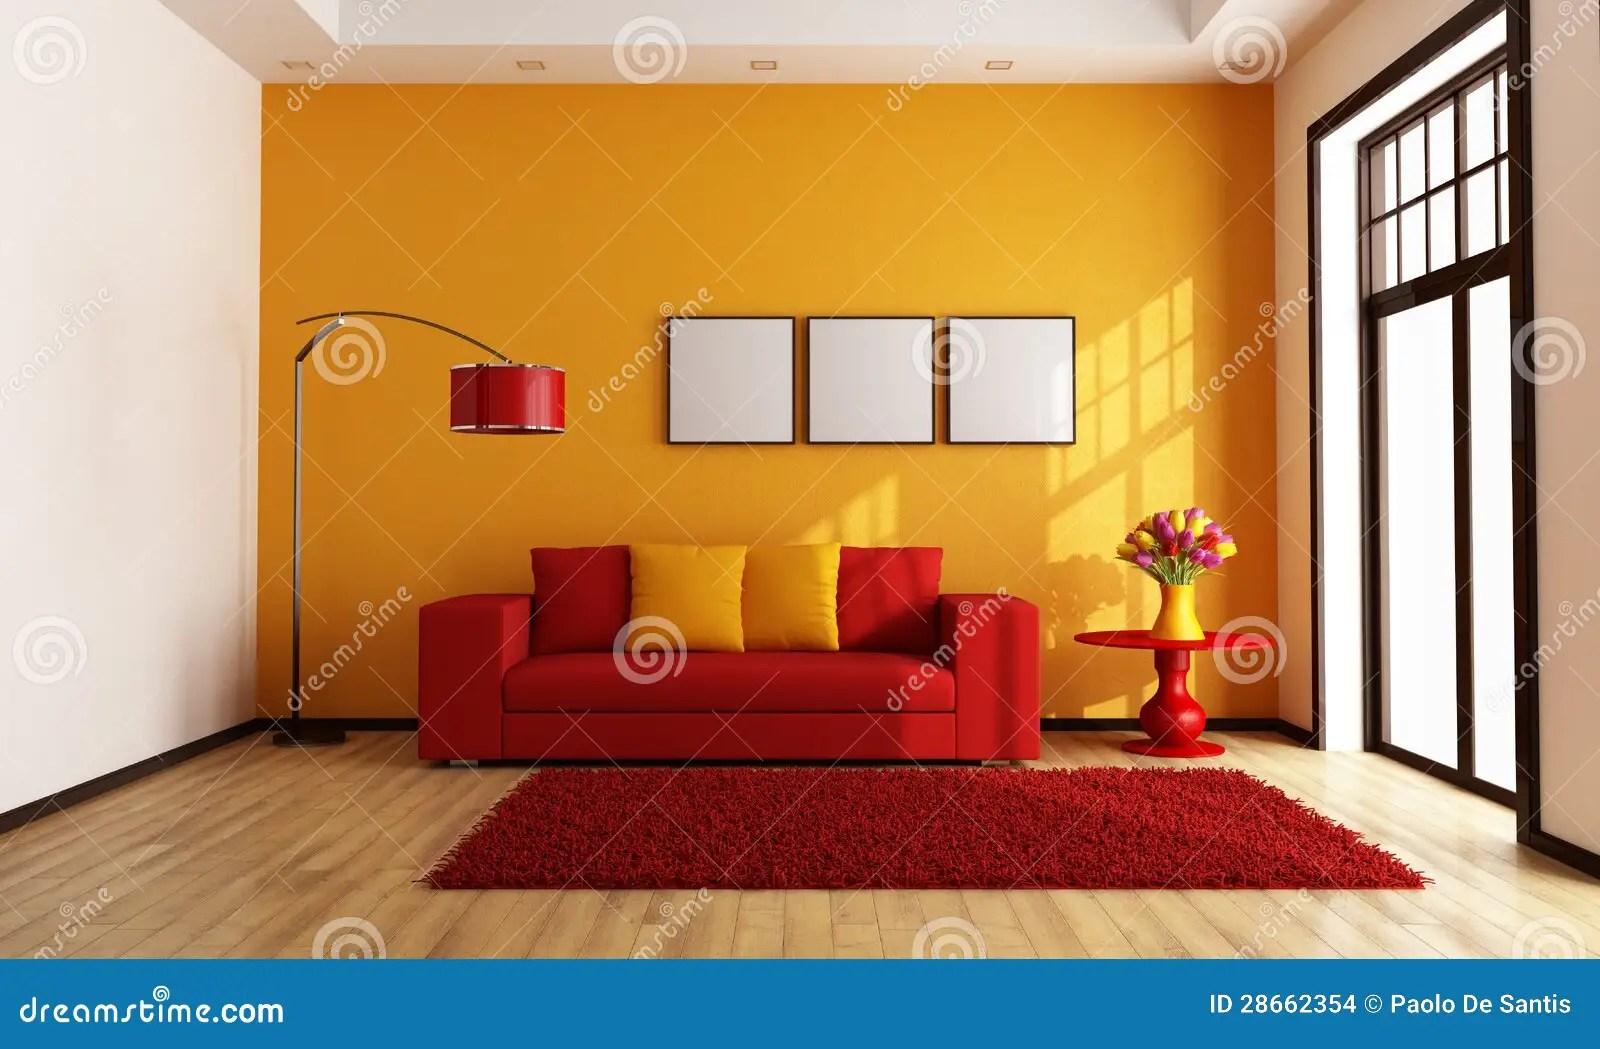 Modern Red Black And White Living Room